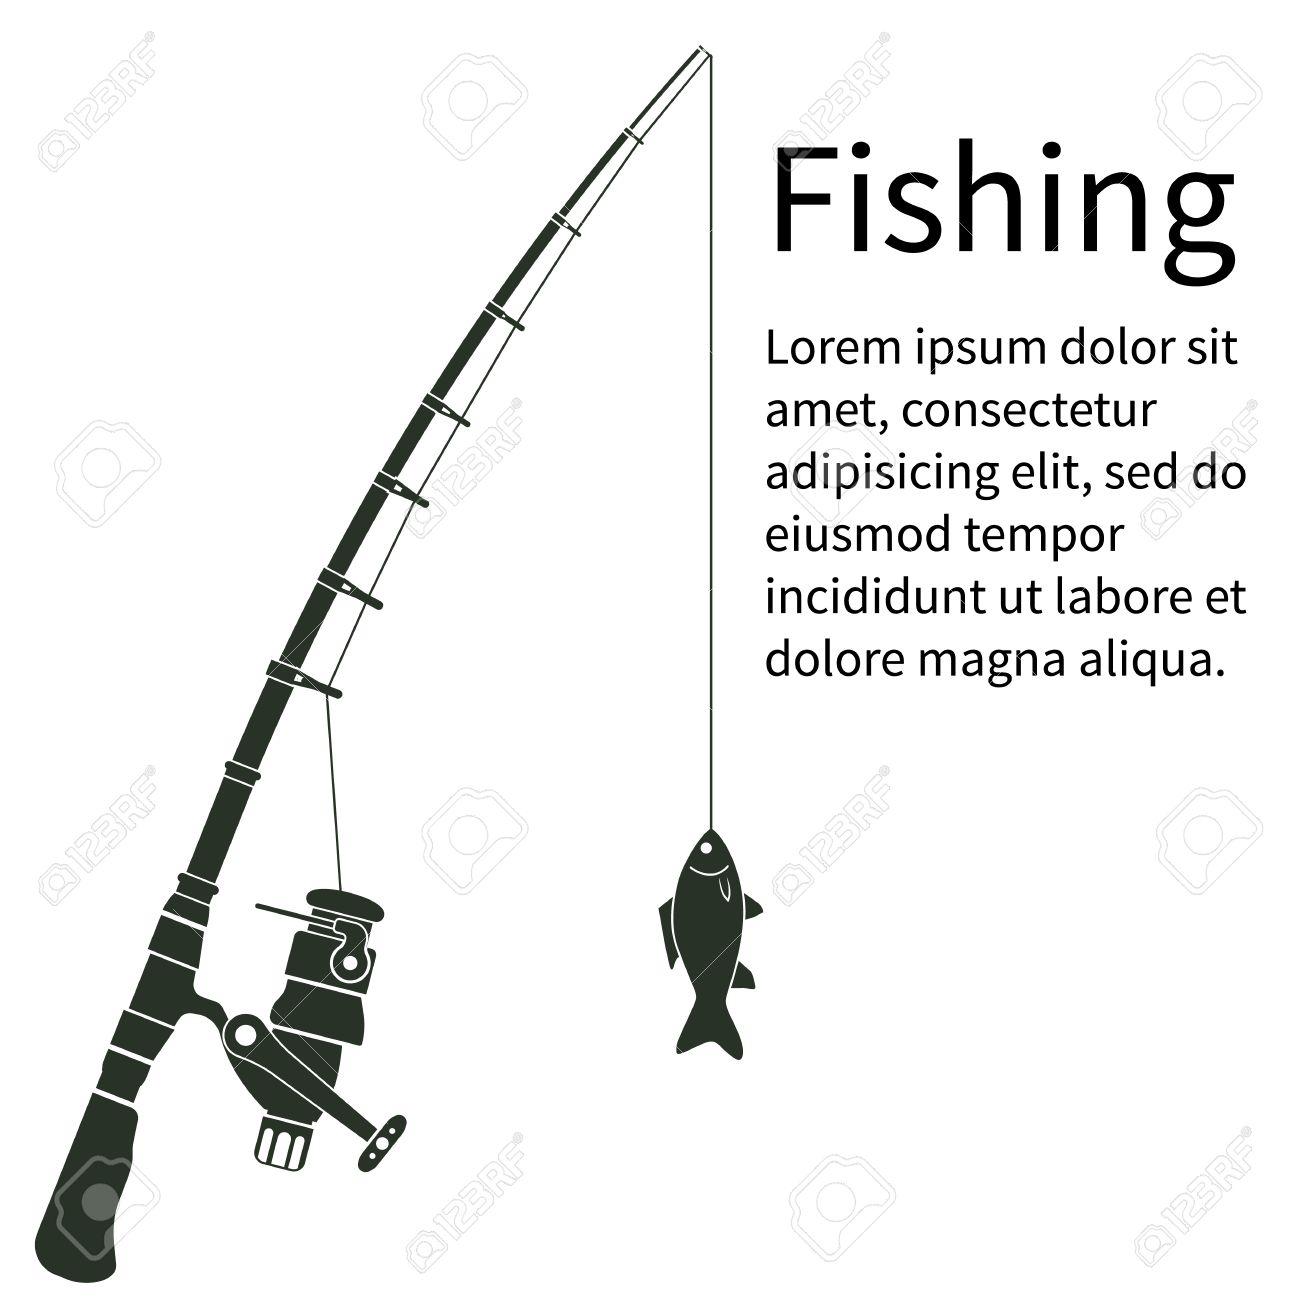 1300x1300 Fishing Pole Clipart Kid 9 Fishing Logos Hanslodge Library